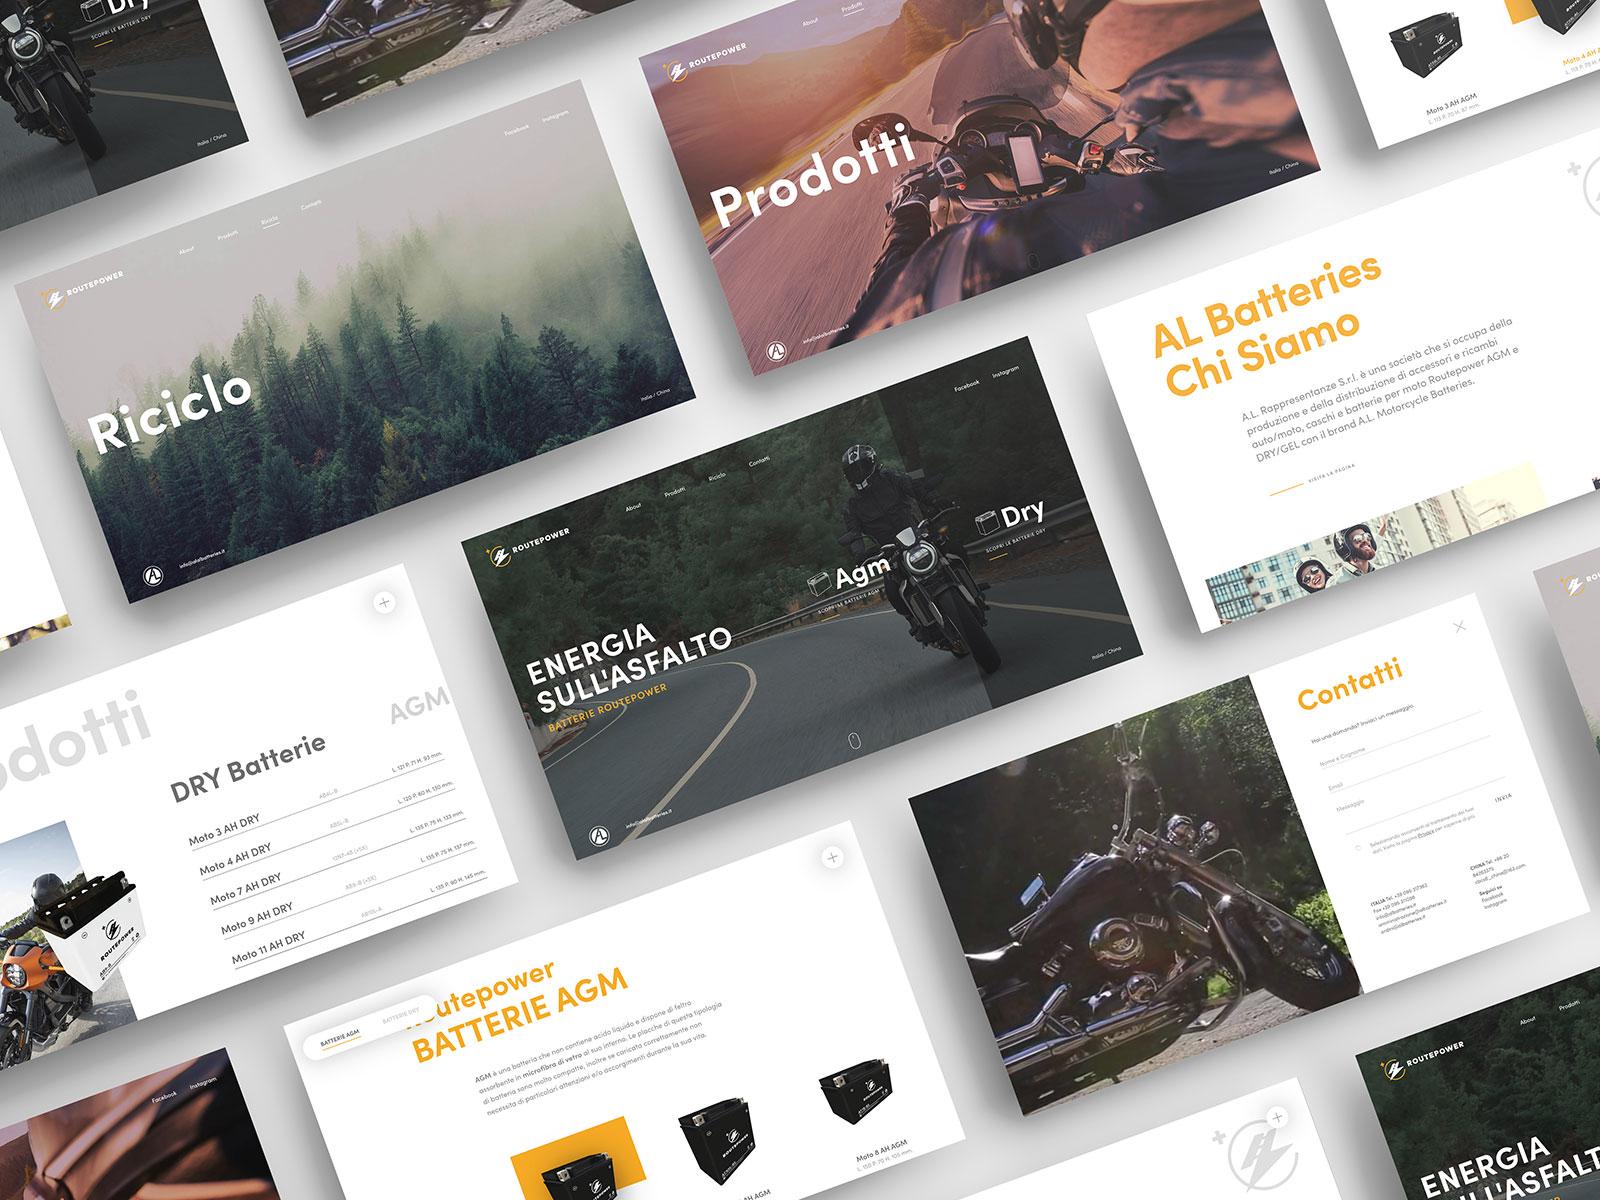 Studio K95 – Routepower - Web Design